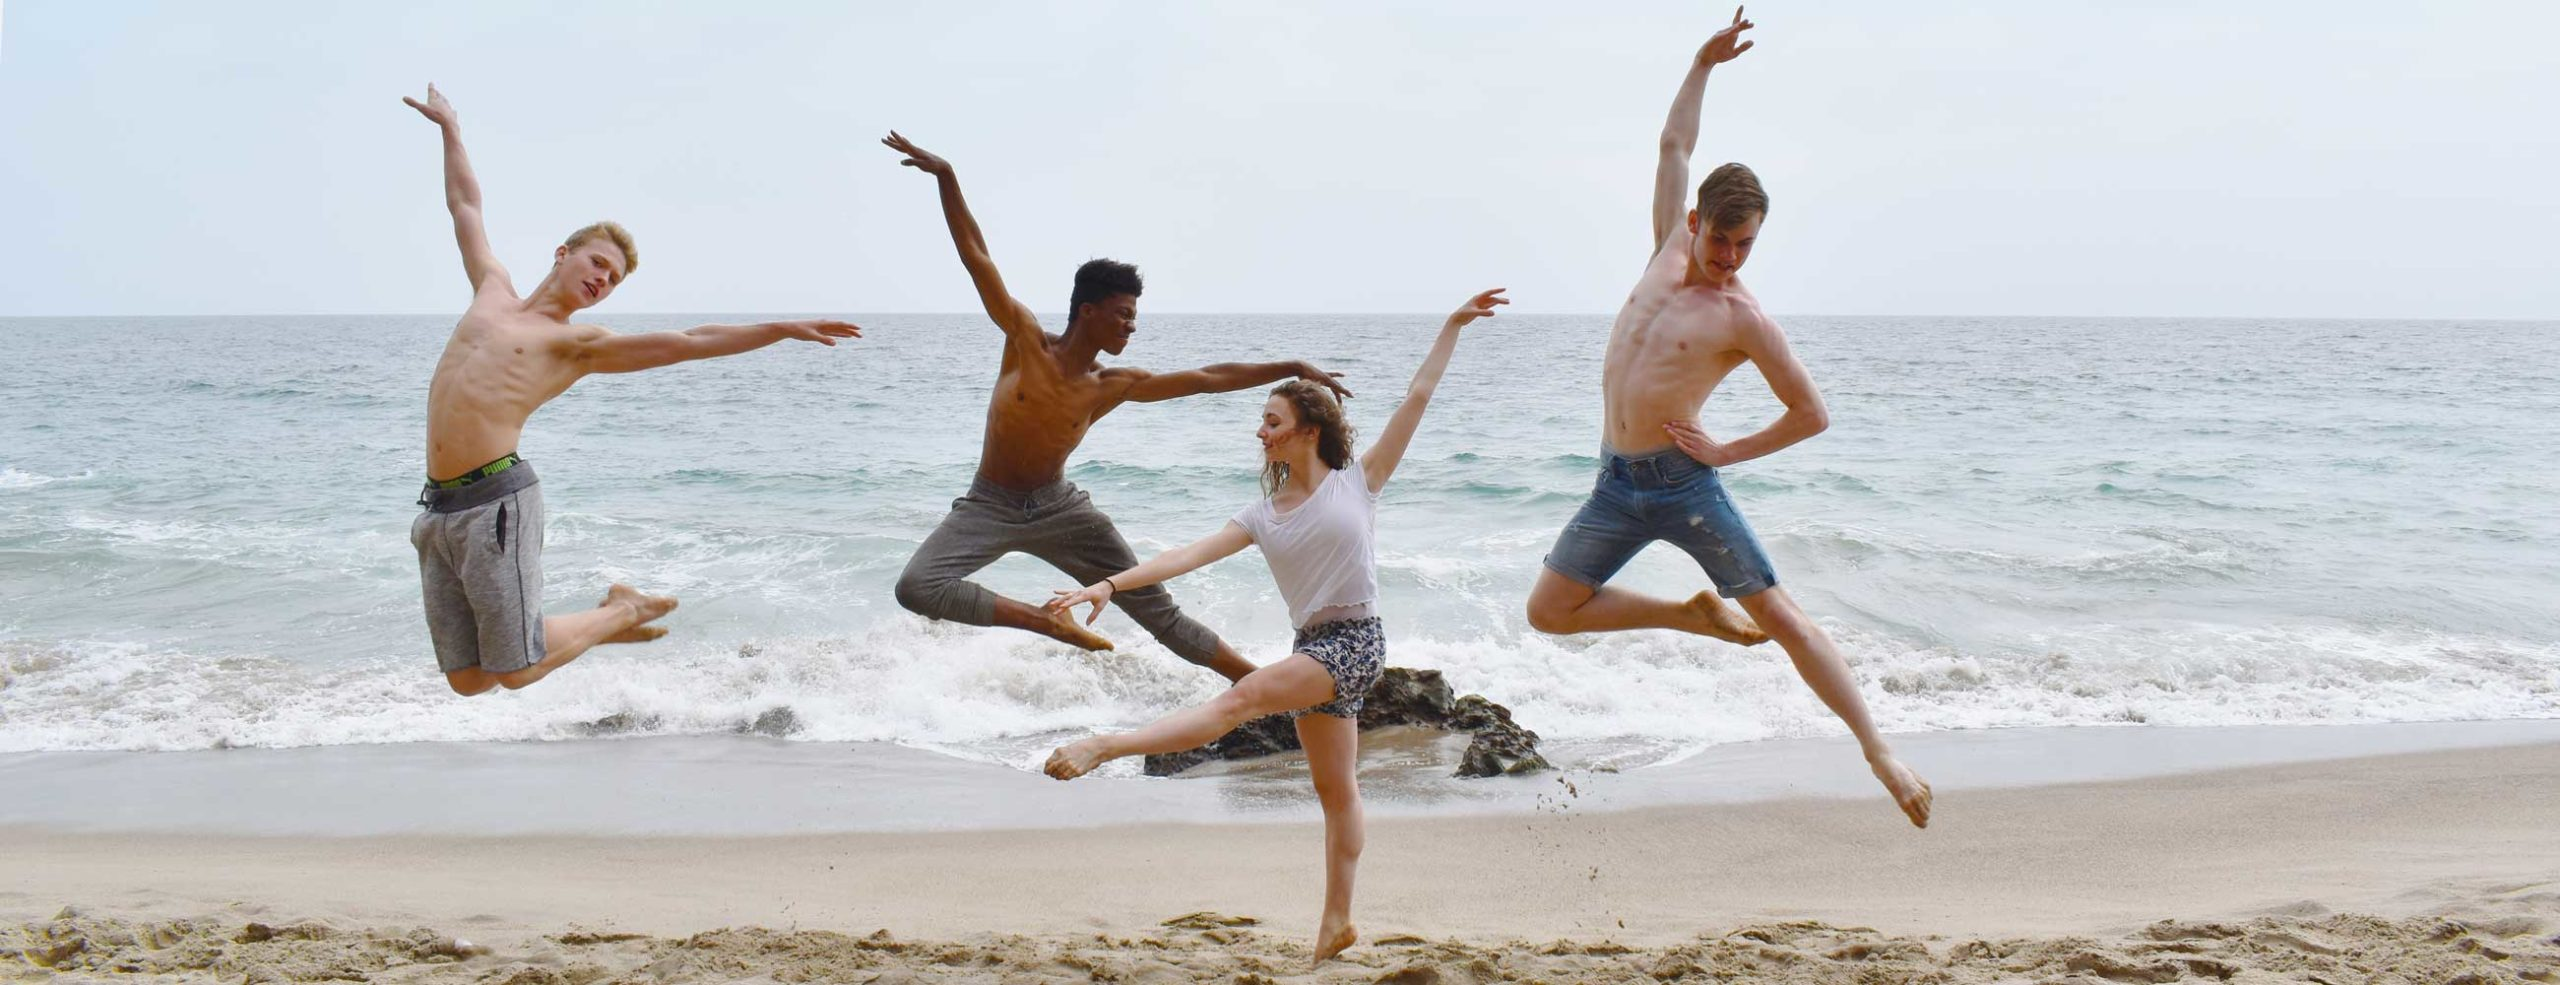 Dance Academy students posing on the beach